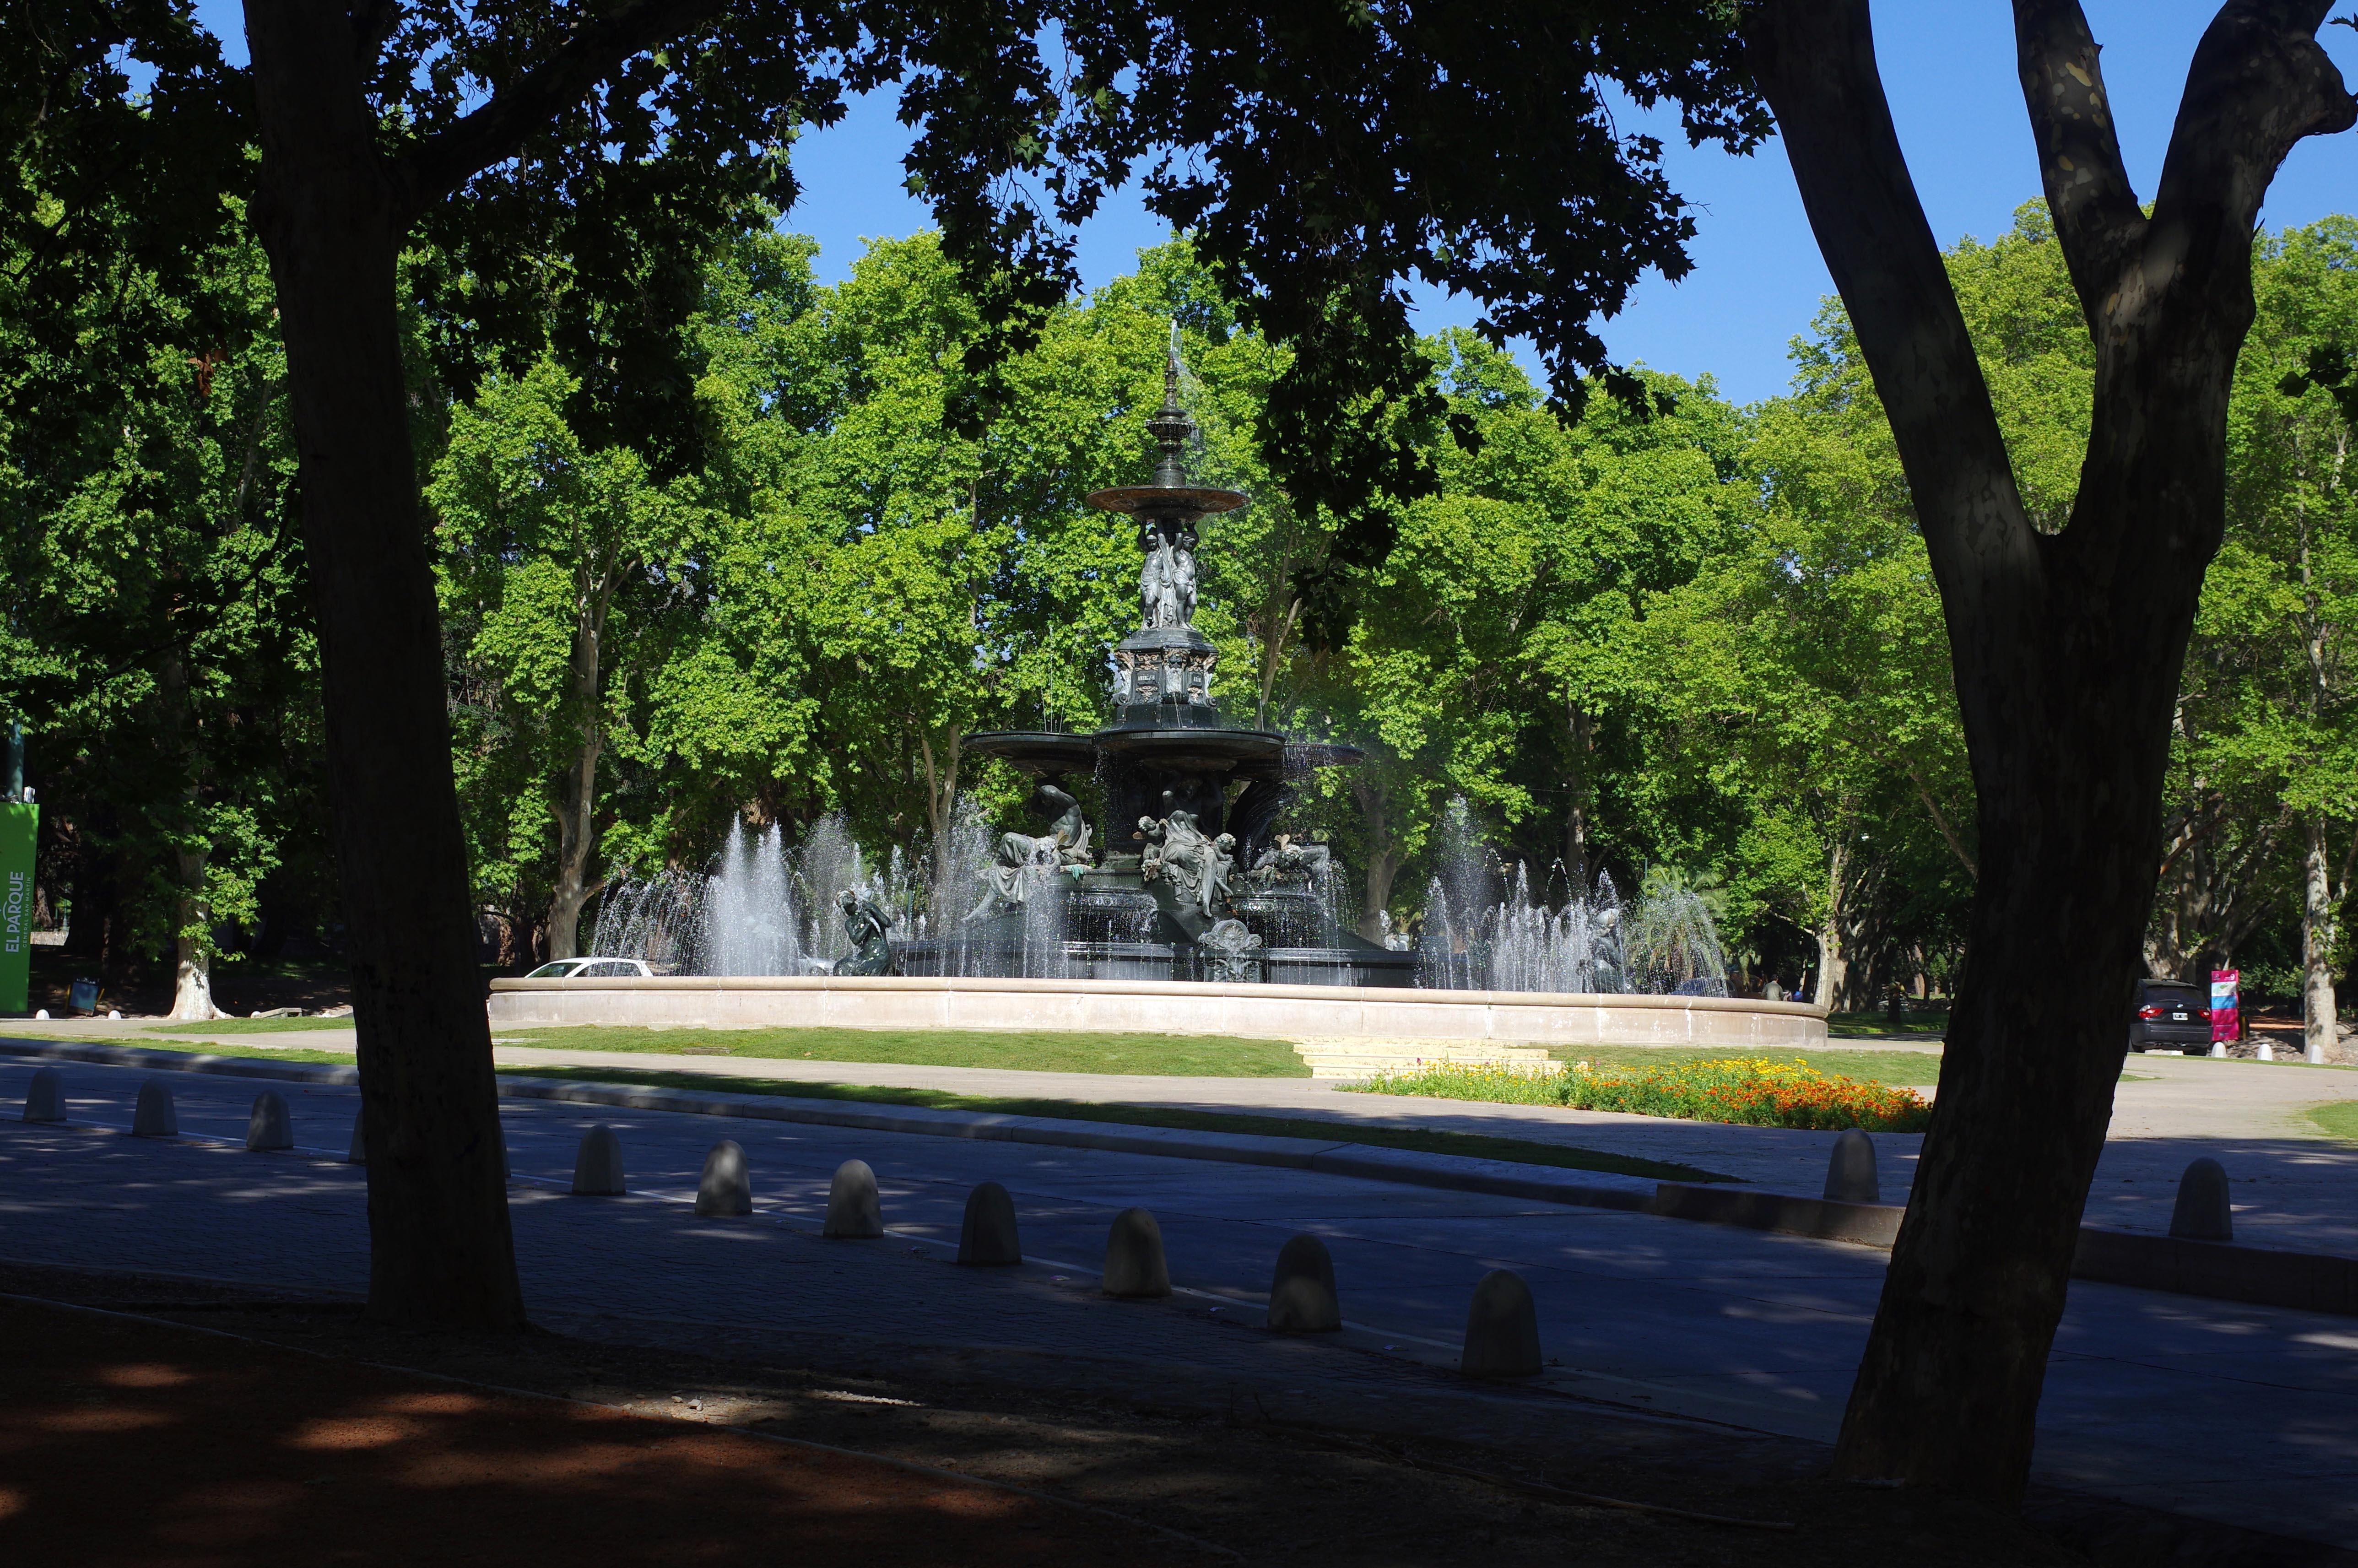 171226_Mendoza-CerroGloria62